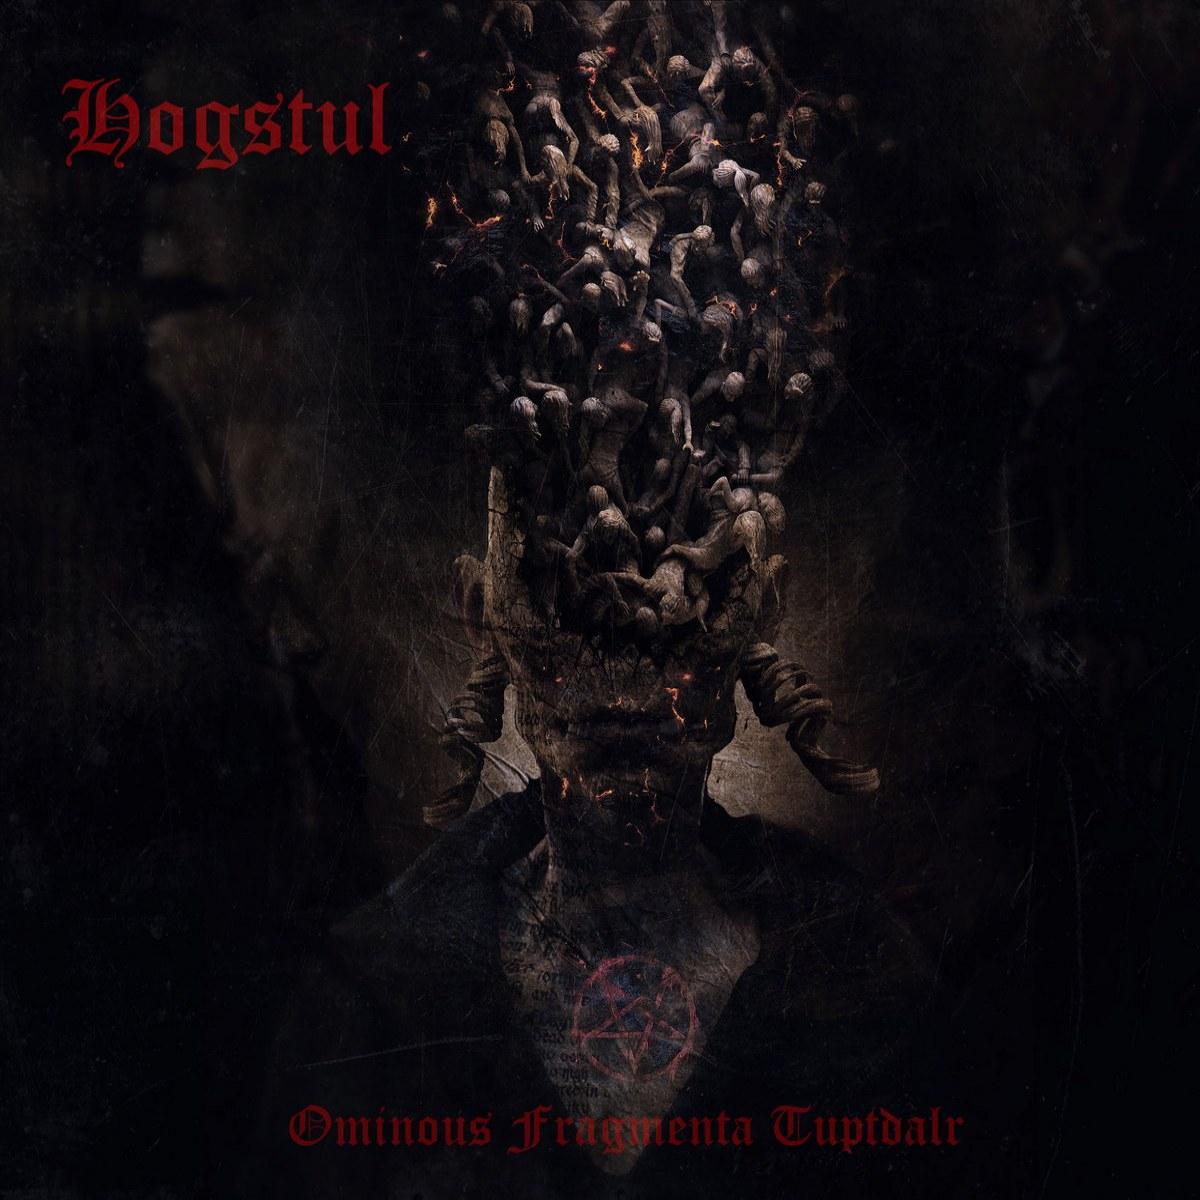 Hogstul - Ominous Fragmenta Tuptdalr